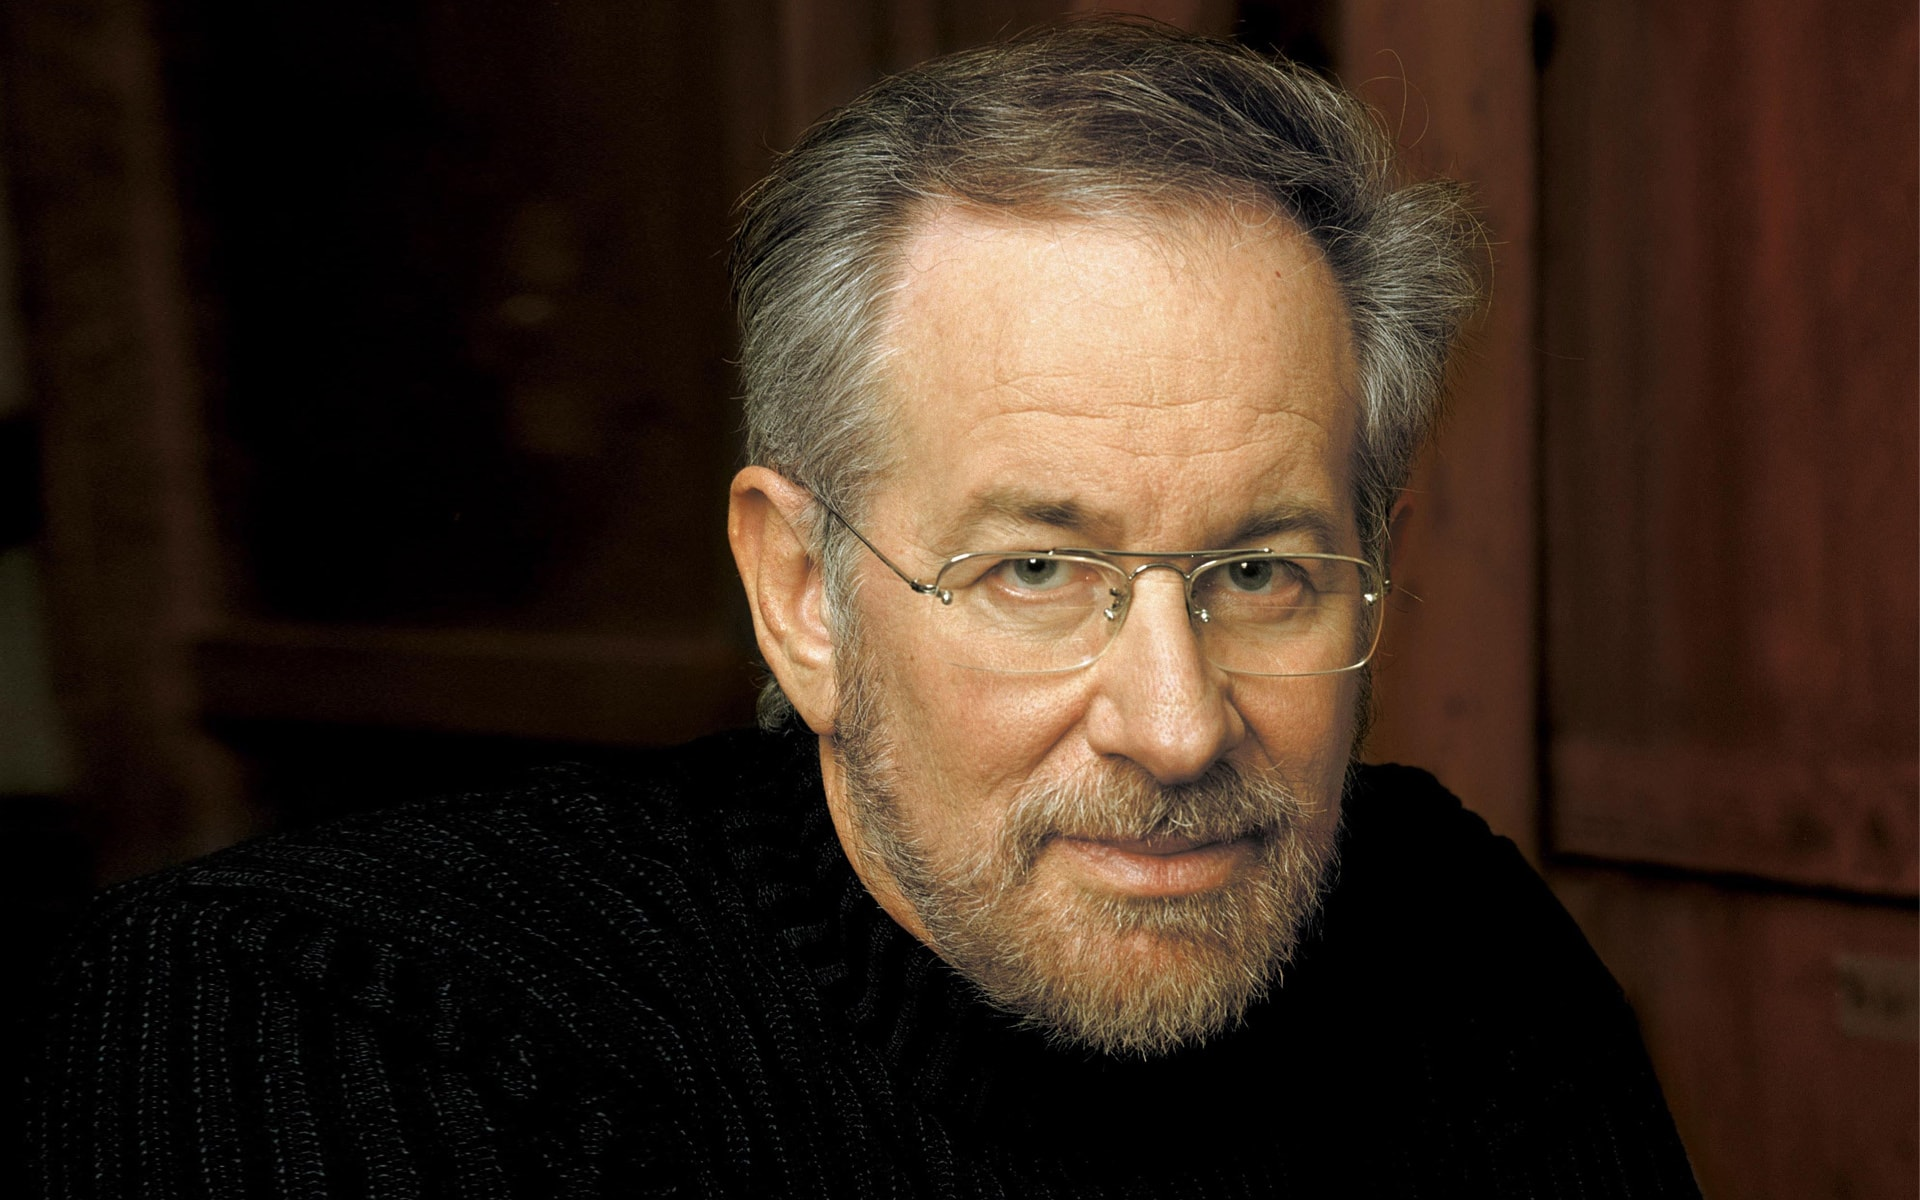 Steven Spielberg HD pics